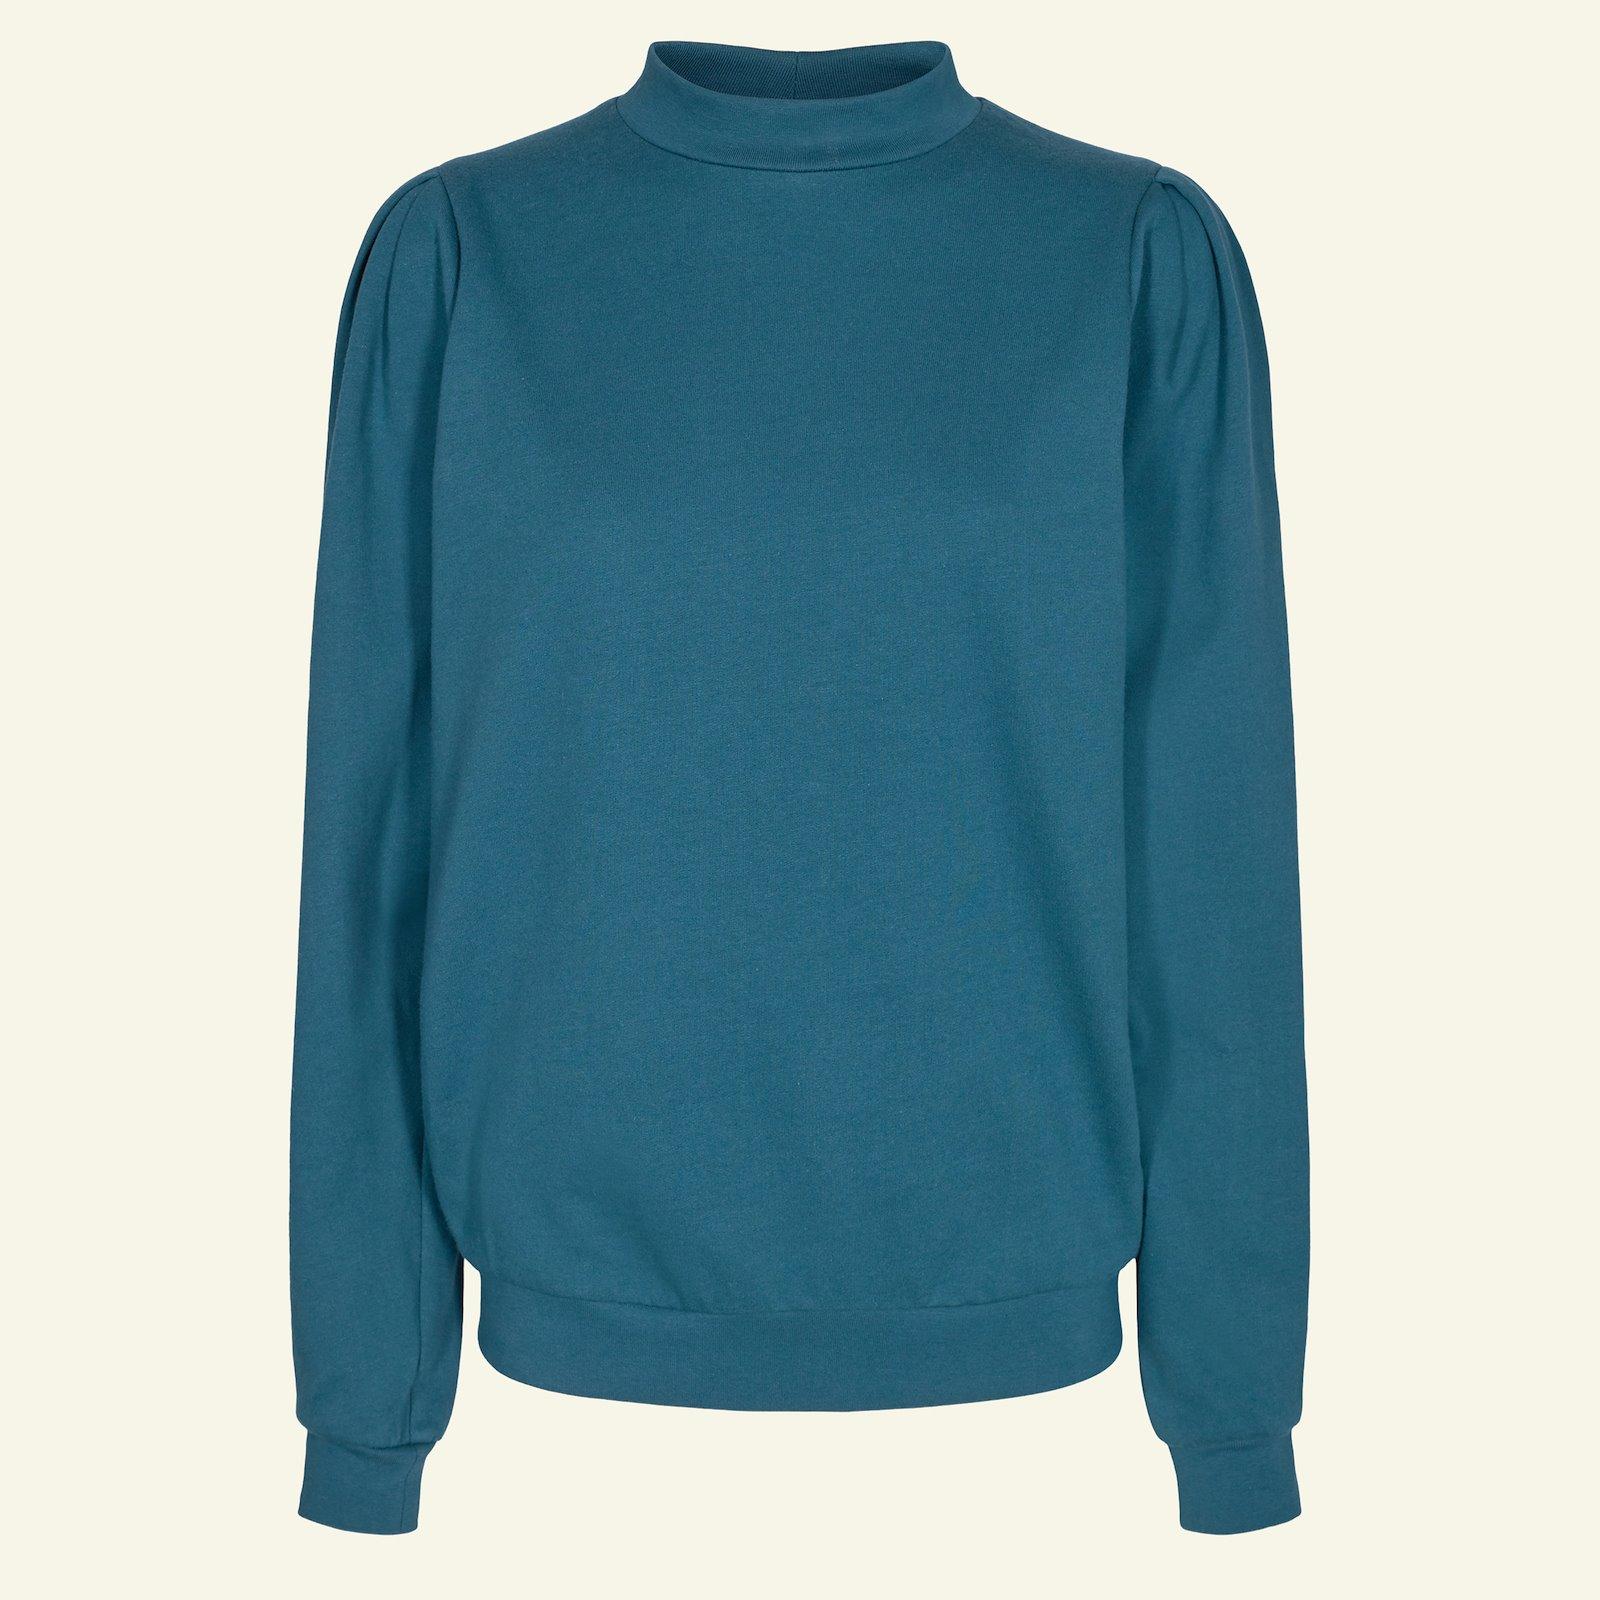 Sweatshirt with puff sleeves, M p22074_211775_230657_sskit